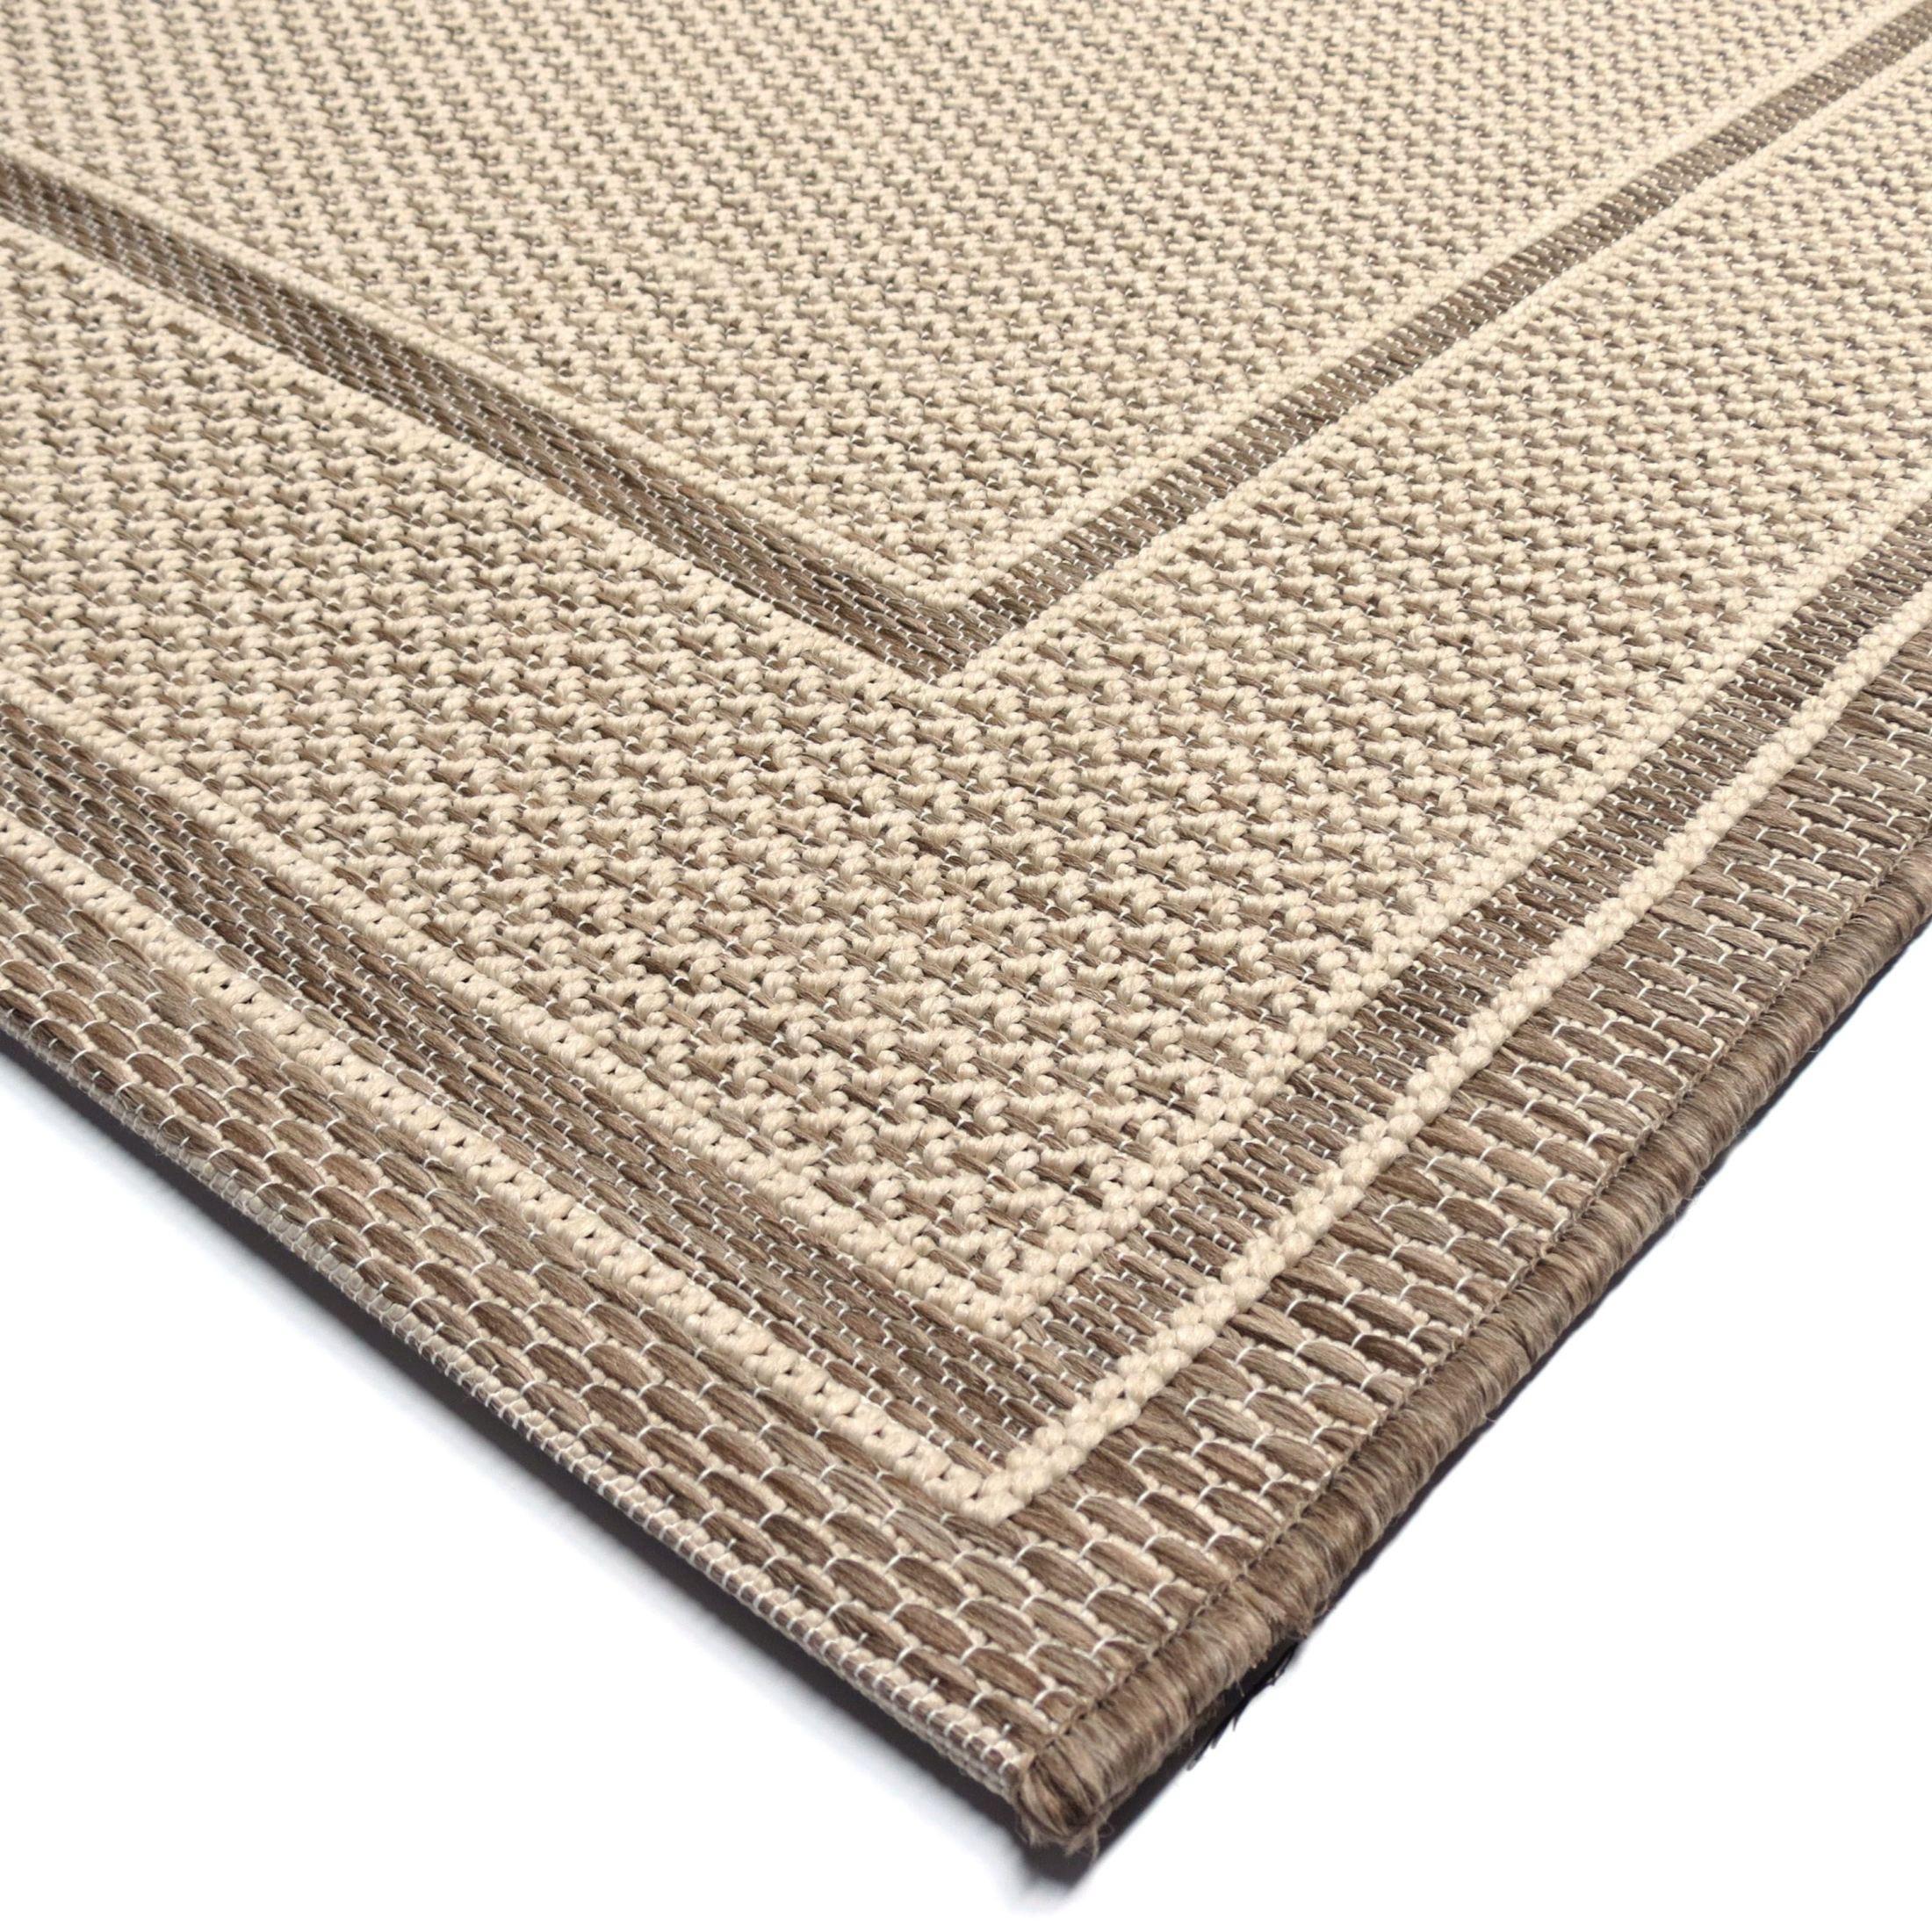 Discount 8x11 Area Rugs: Jersey Home Indoor/Outdoor Border Bonita Tan Large Area